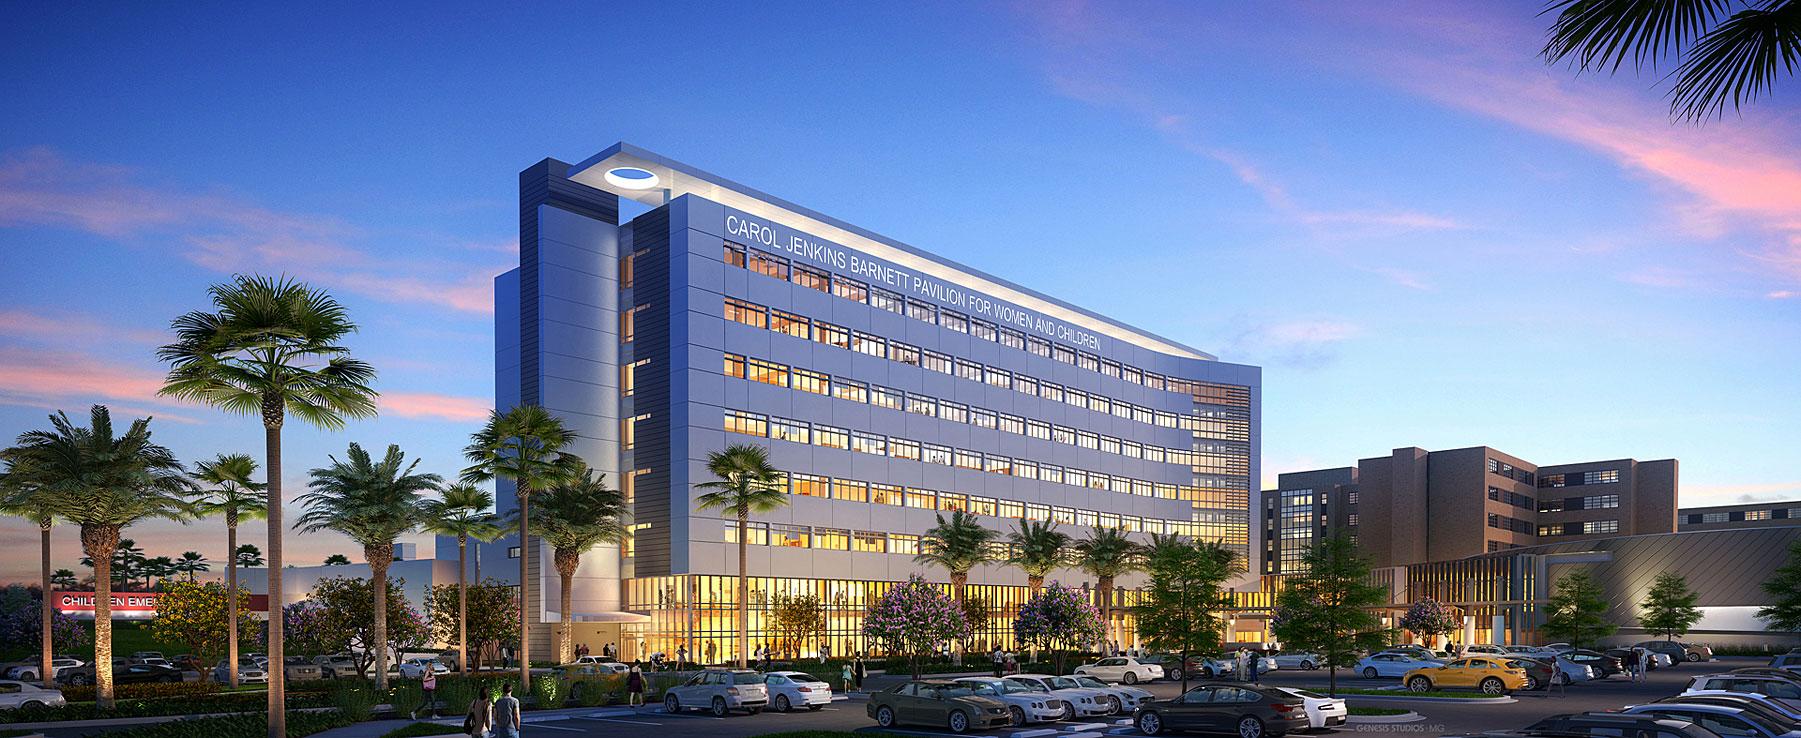 616070 Digital Photorealistic Architectural Renderings of Lakeland Regional Medical Center Exterior at Dusk for Hunton Brady Architects